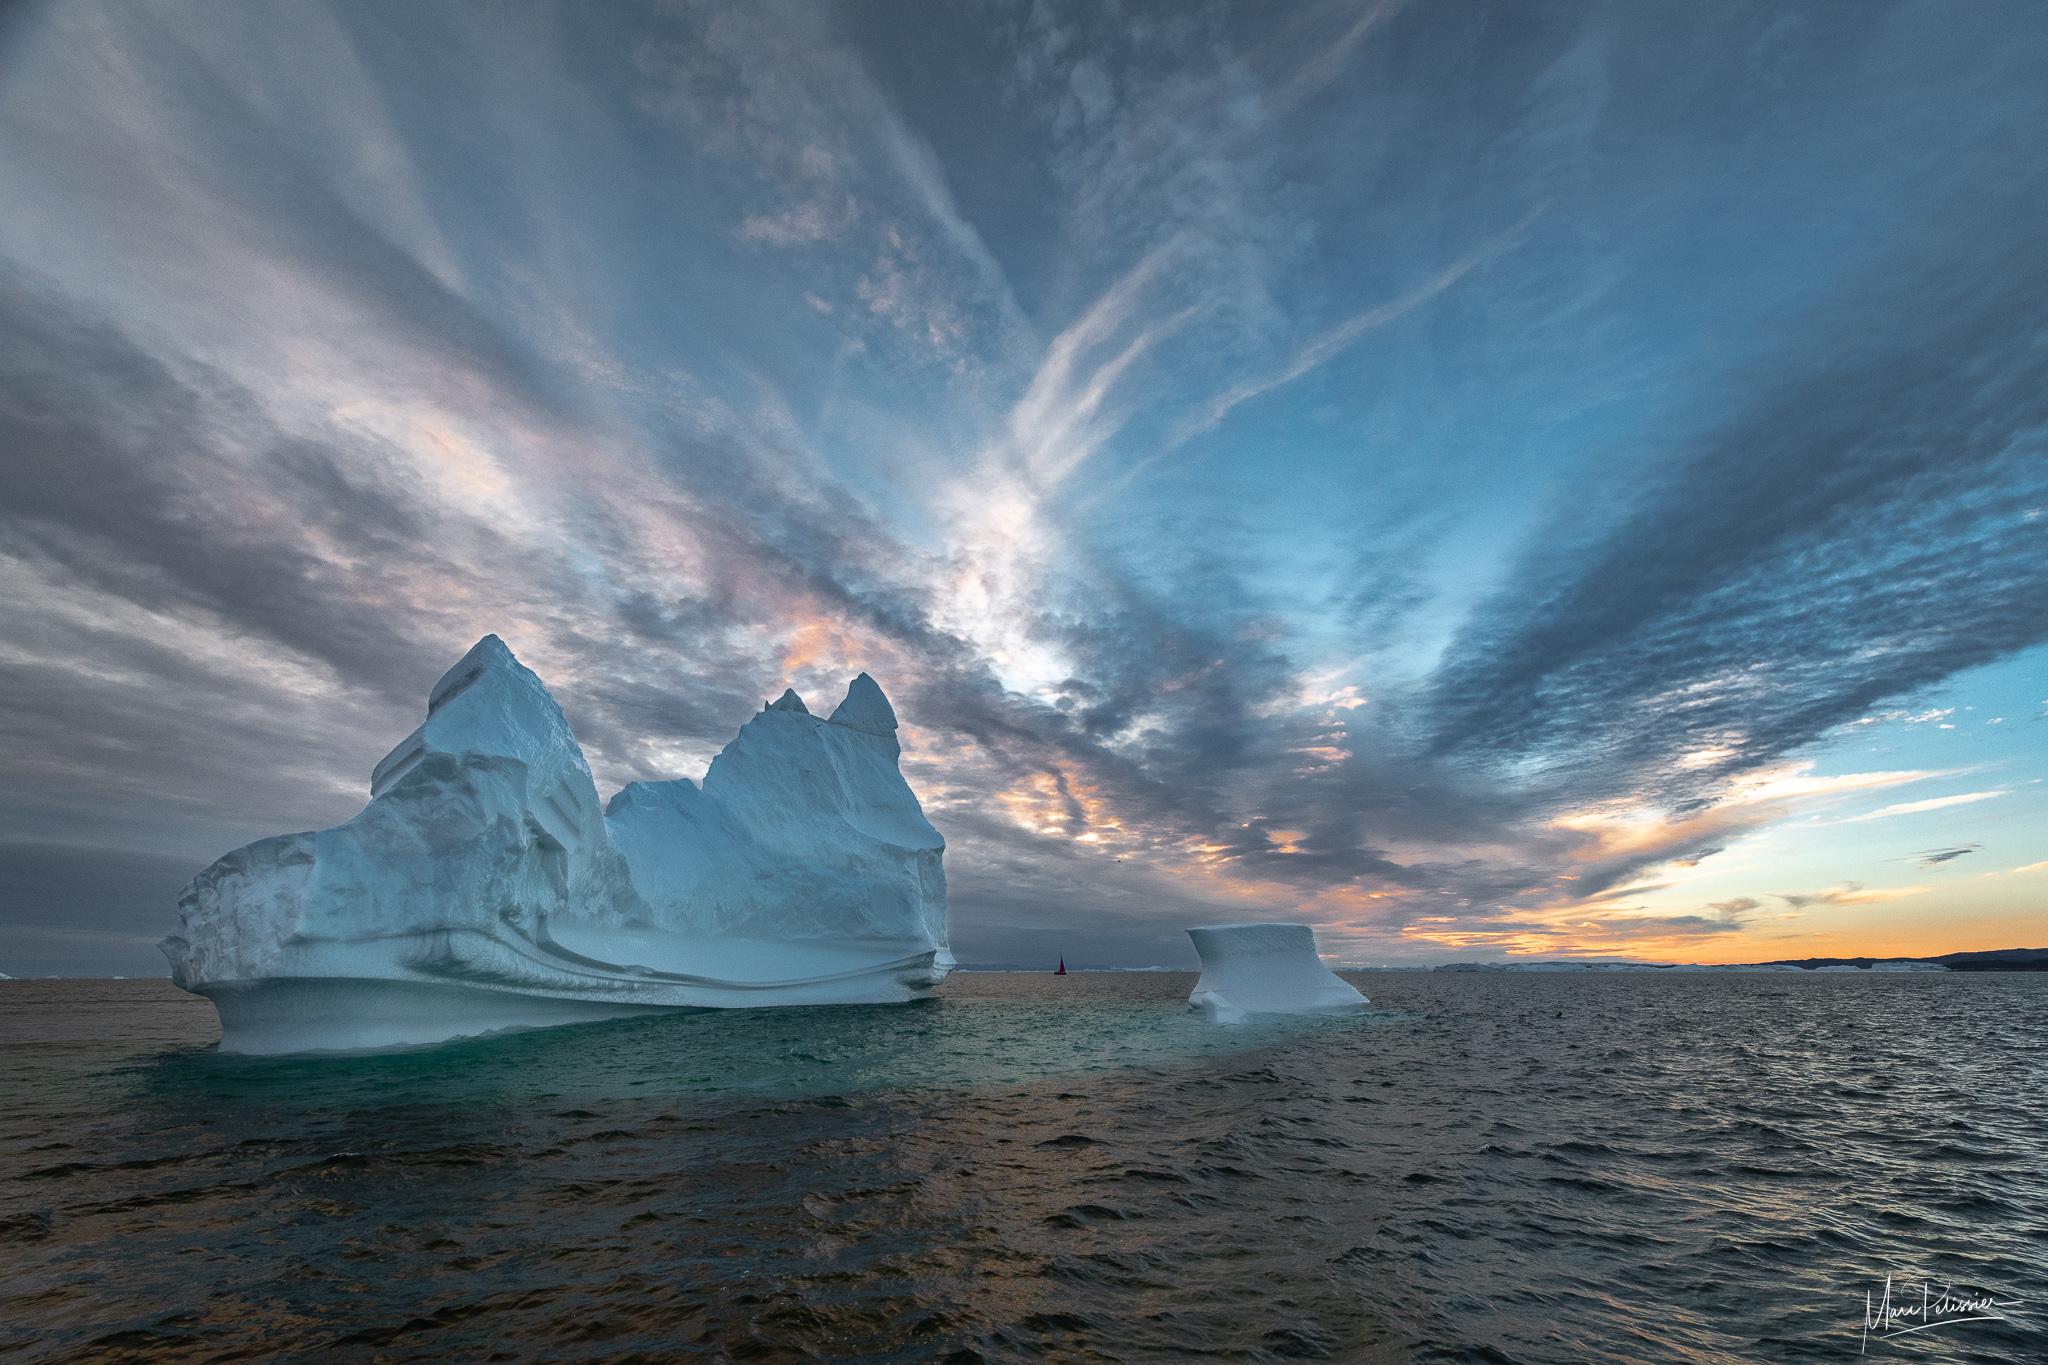 Greenland Claushavn bay, Greenland